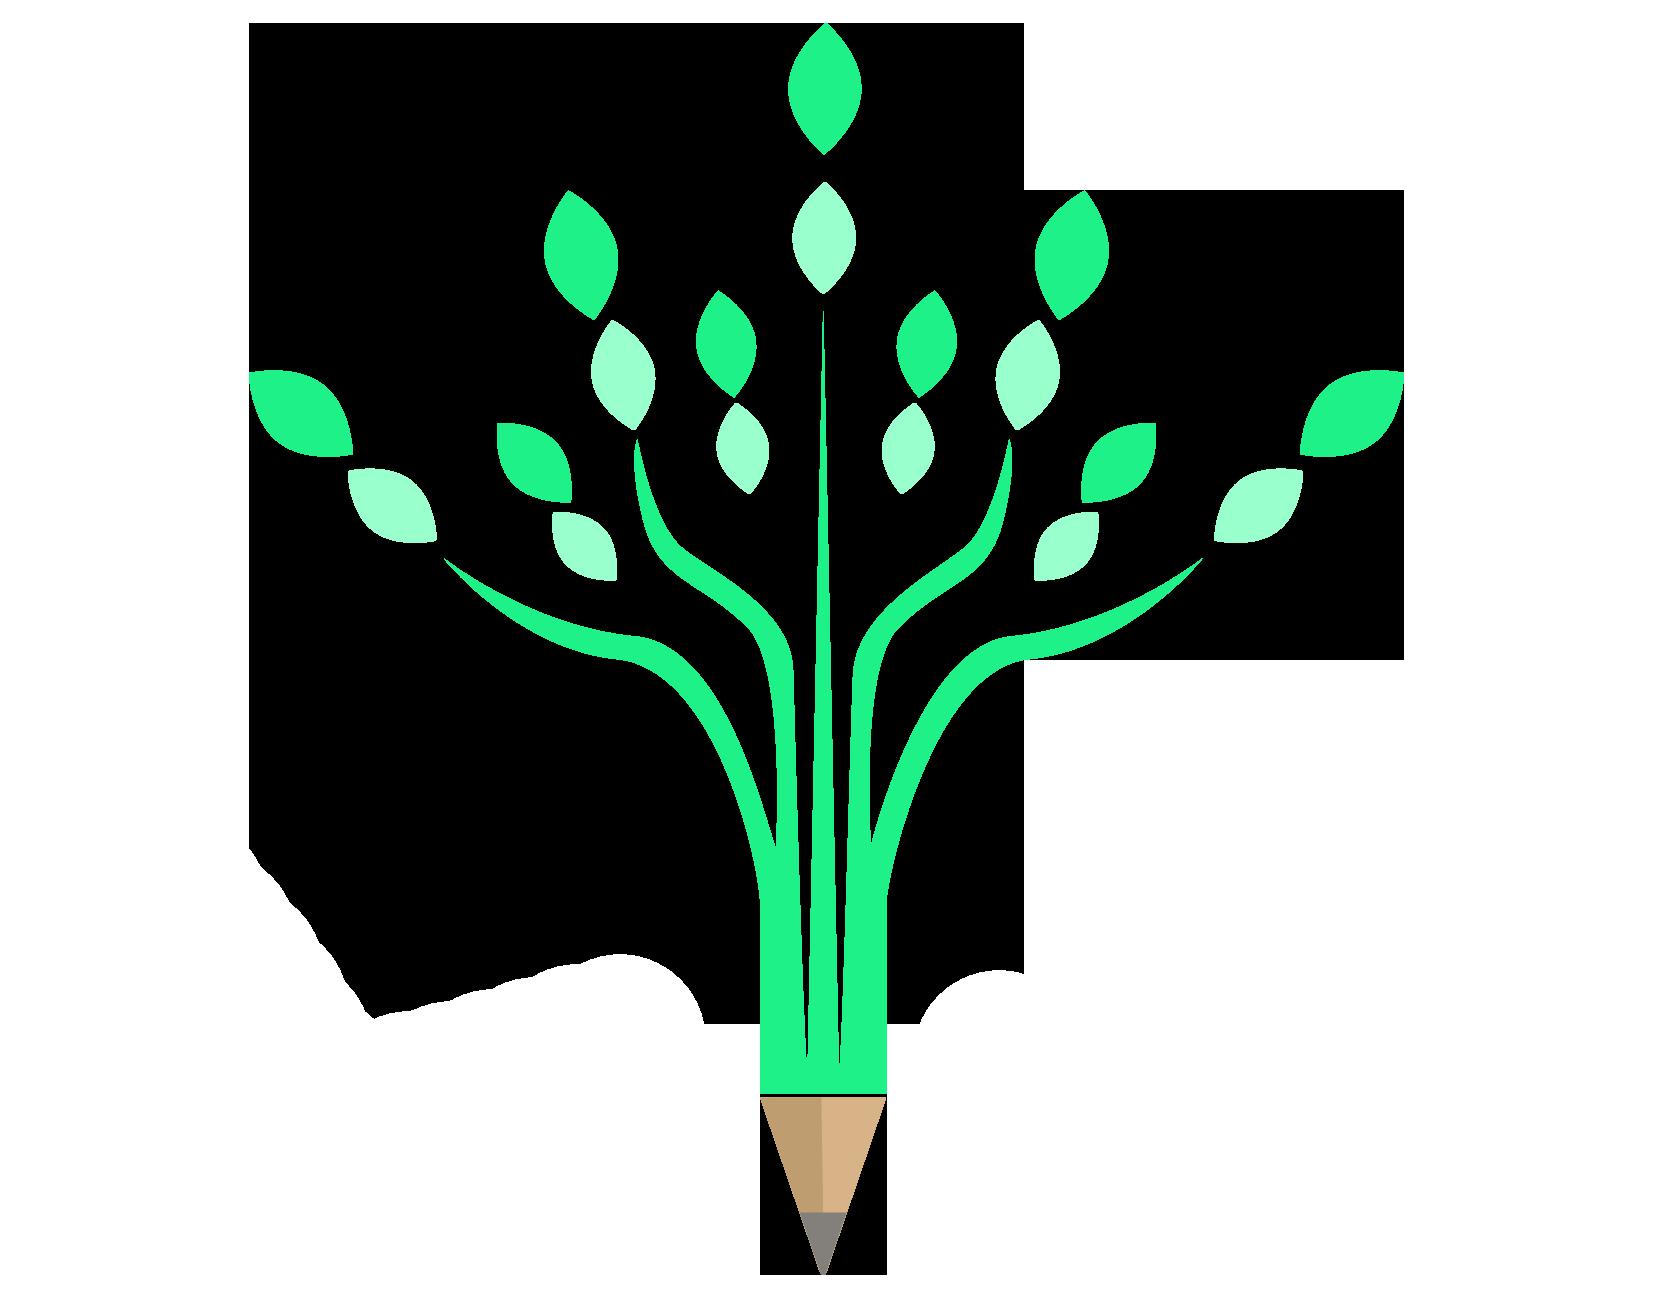 Plant & Pencil